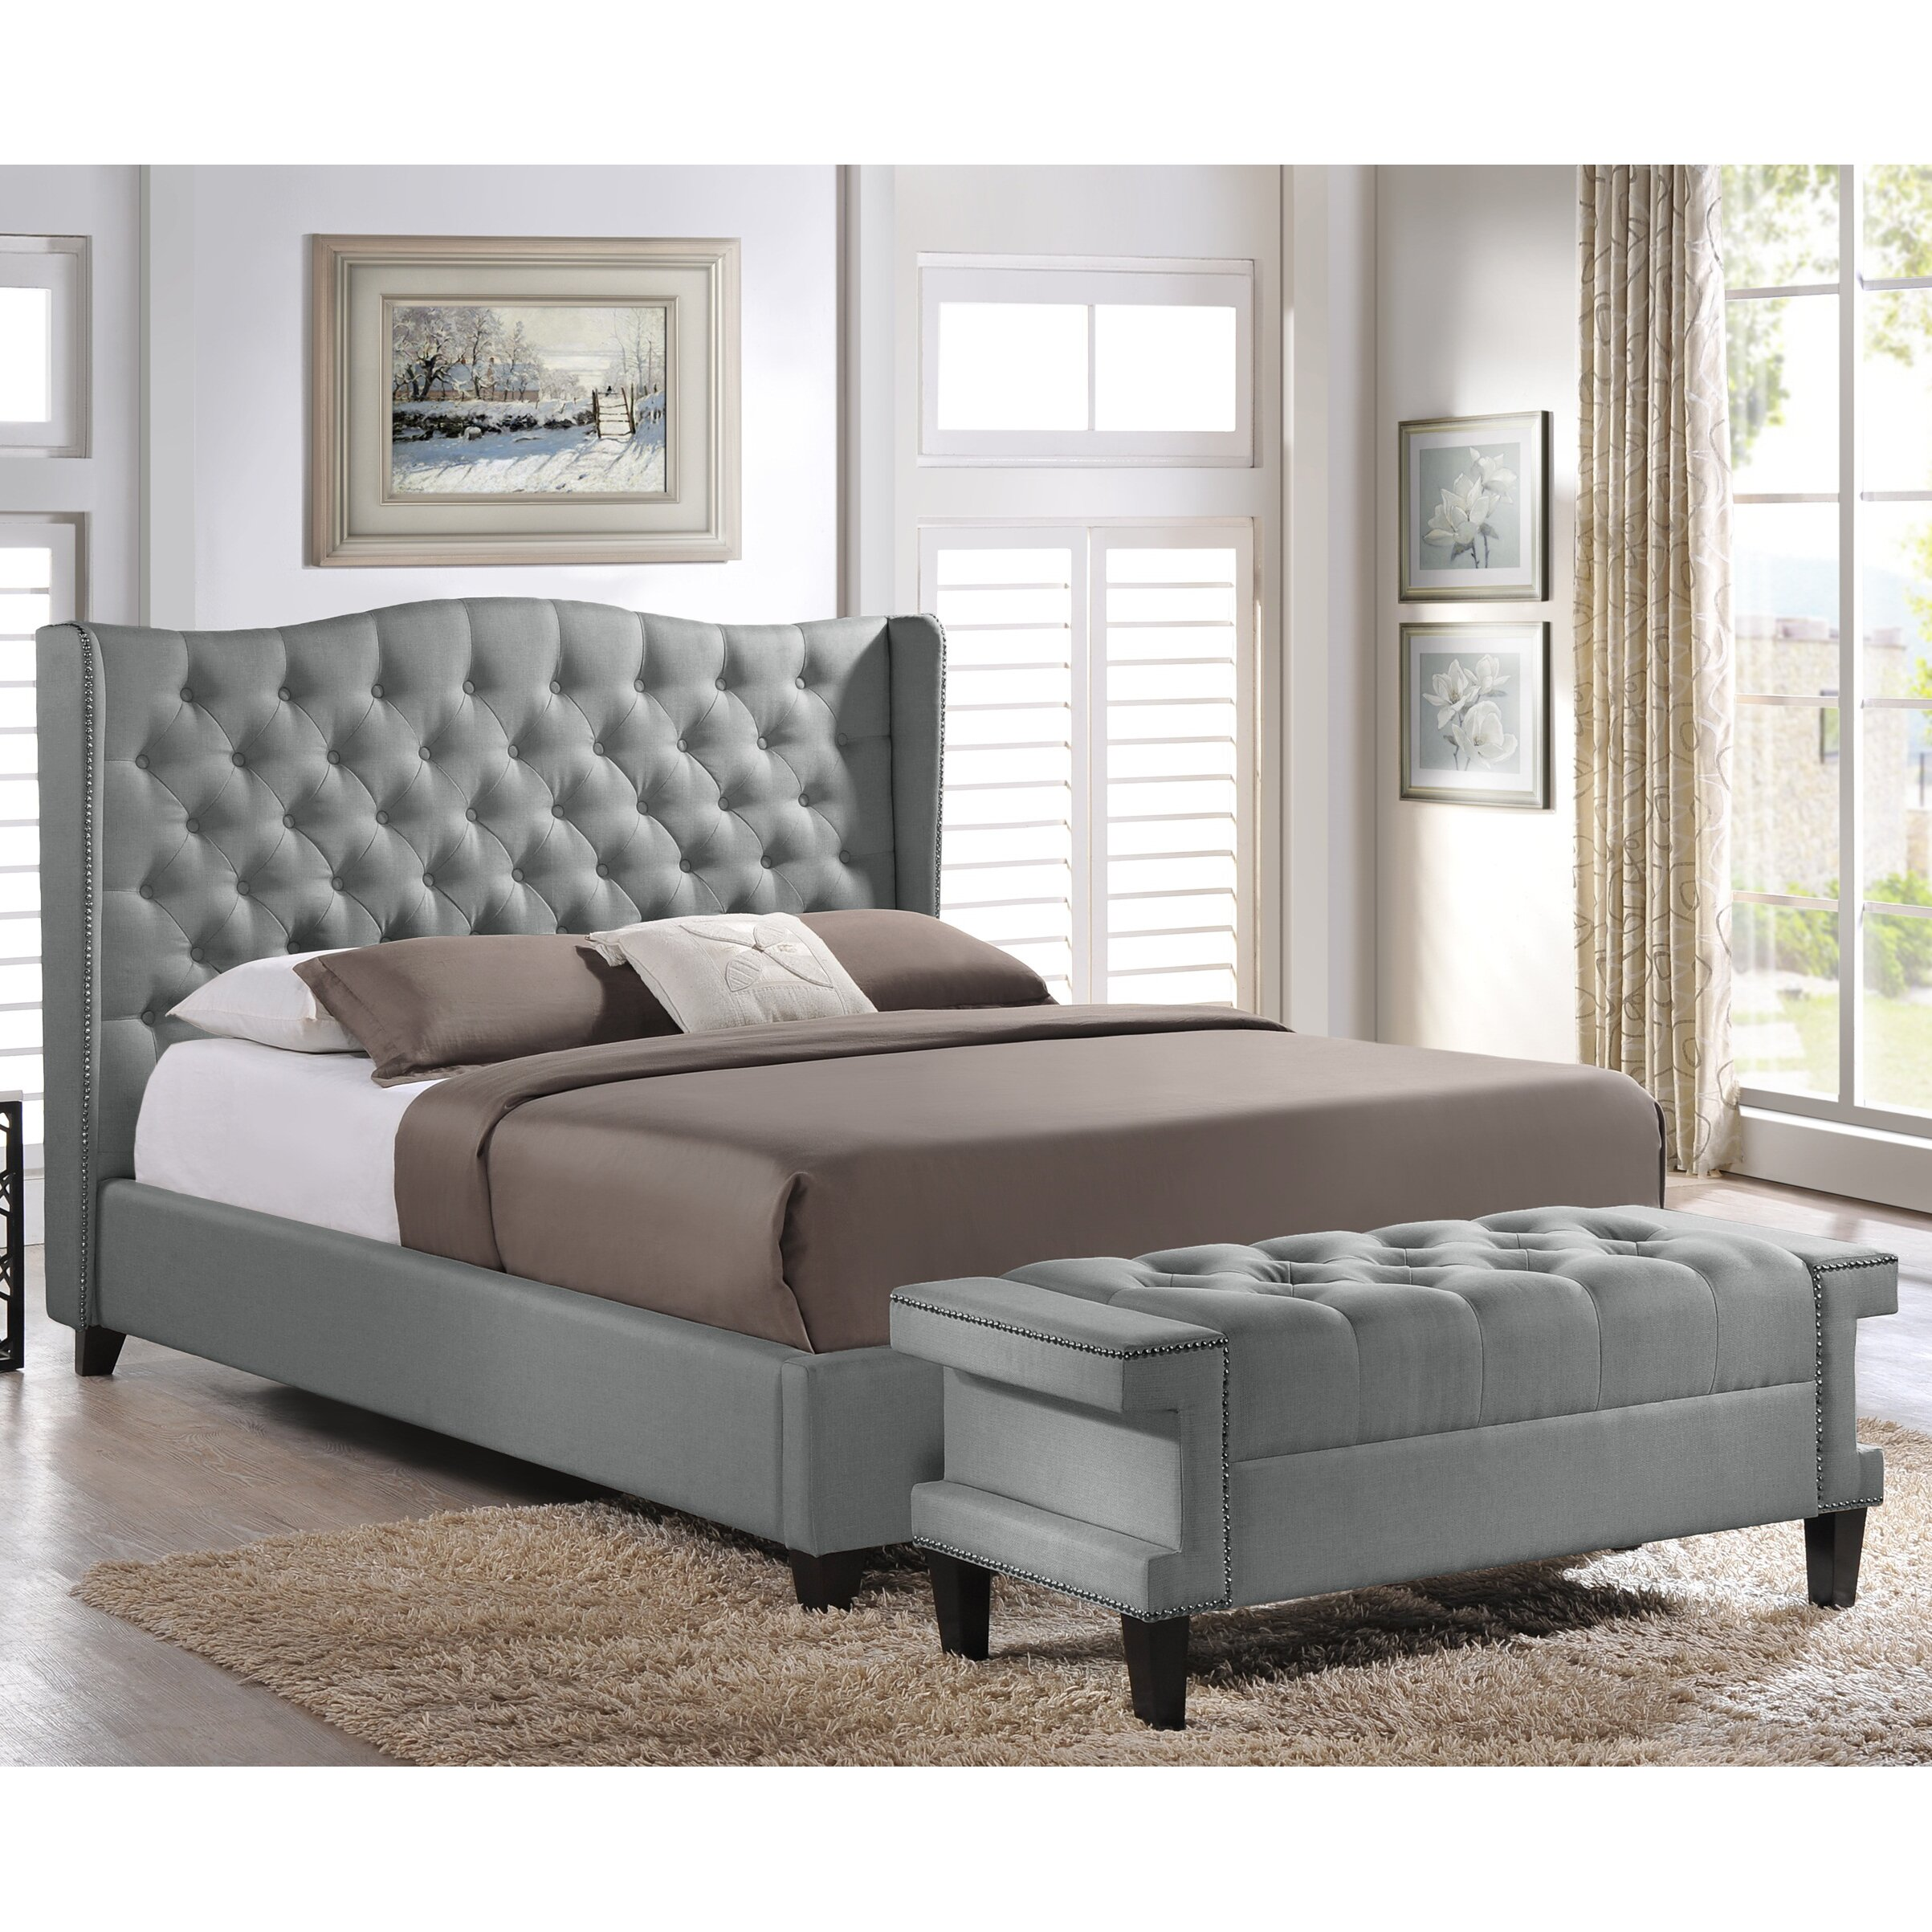 leather sofa repair norwich refil sofa. Black Bedroom Furniture Sets. Home Design Ideas